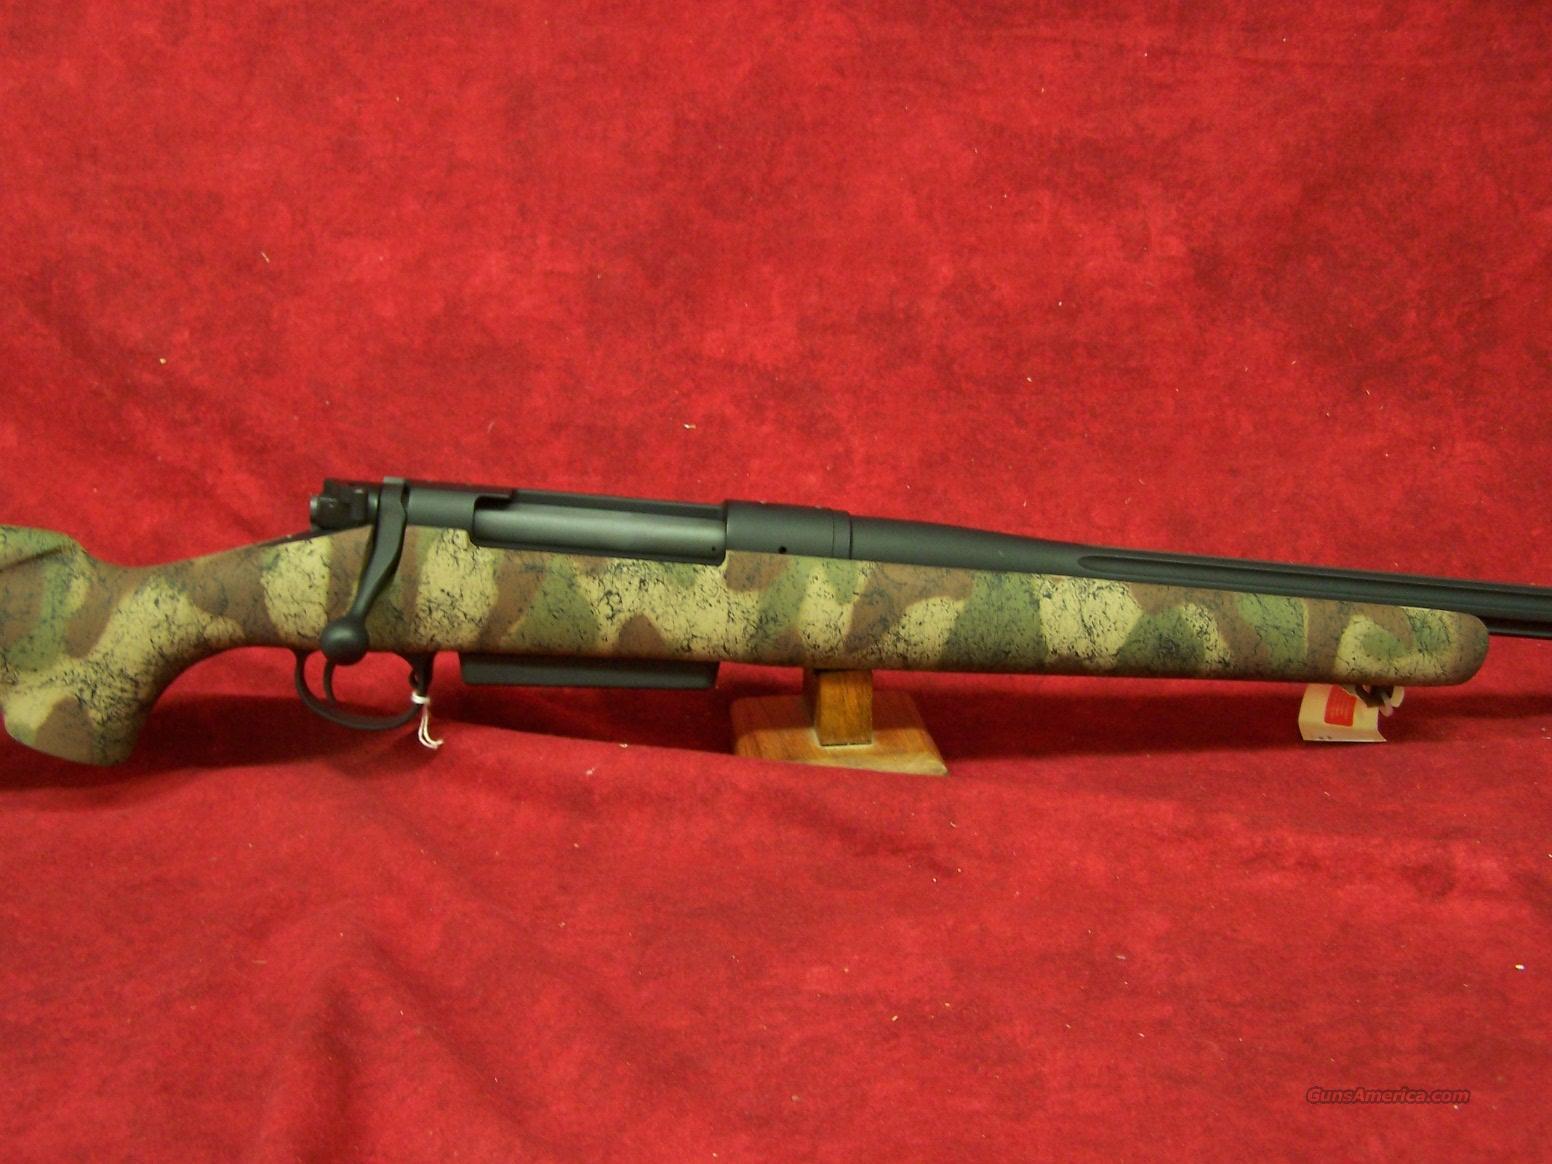 "H-S PRECISION Varmint 6.5 x 284 Norma 26"" Fluted Tri Color Desert HS precision  Guns > Rifles > HS Precision Rifles"